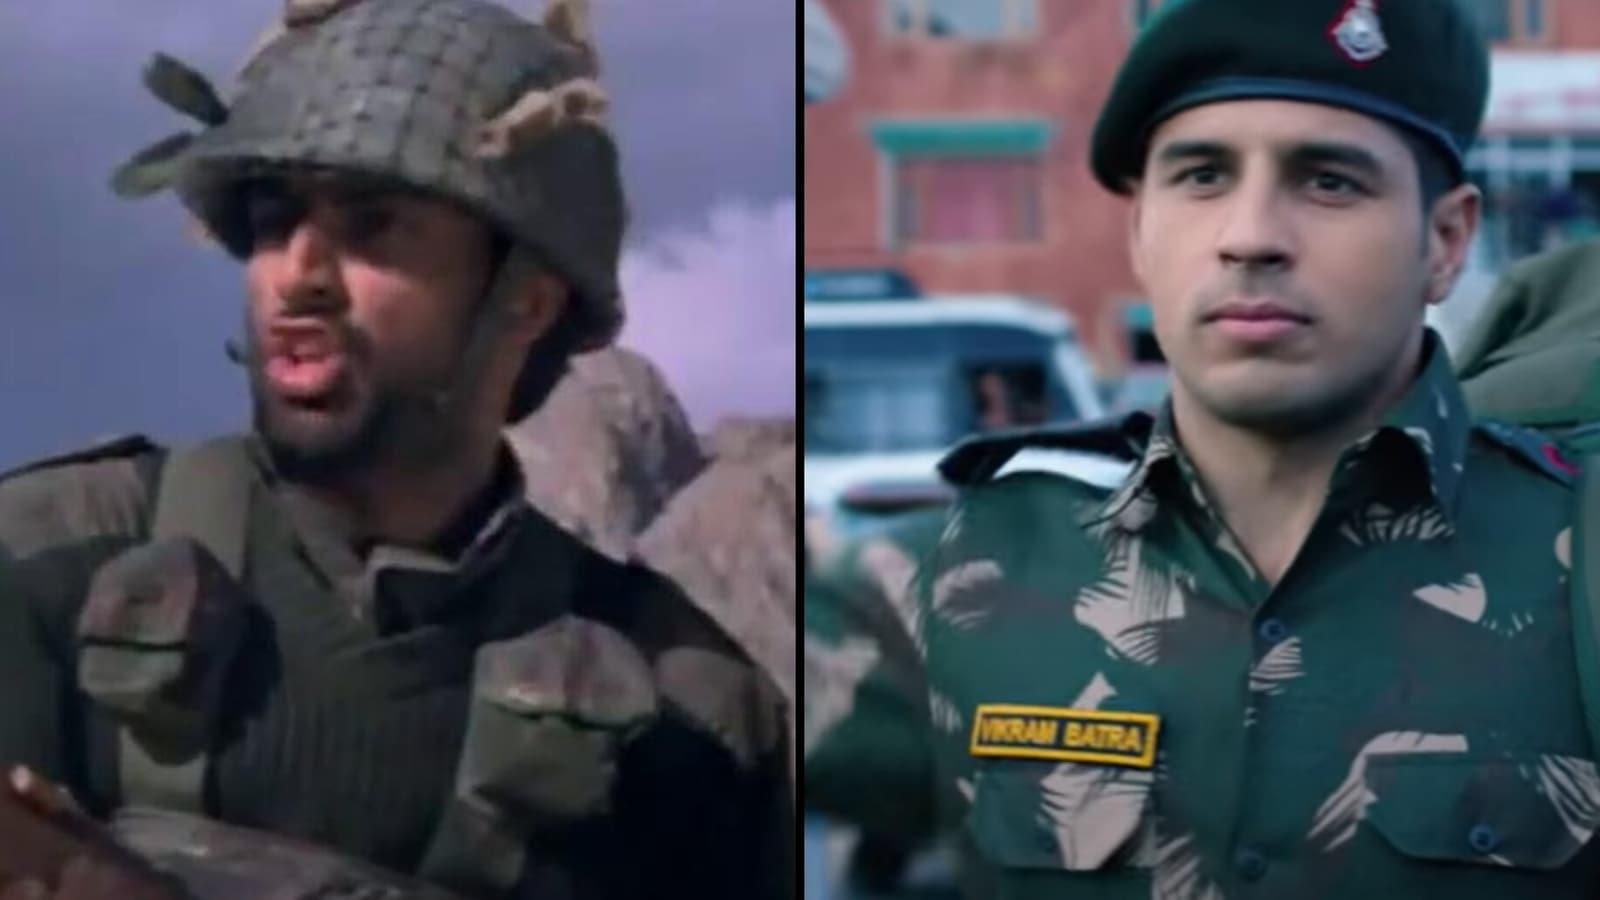 Abhishek Bachchan reacts as fan says he played Captain Vikram Batra 'way better' than Sidharth Malhotra - Hindustan Times